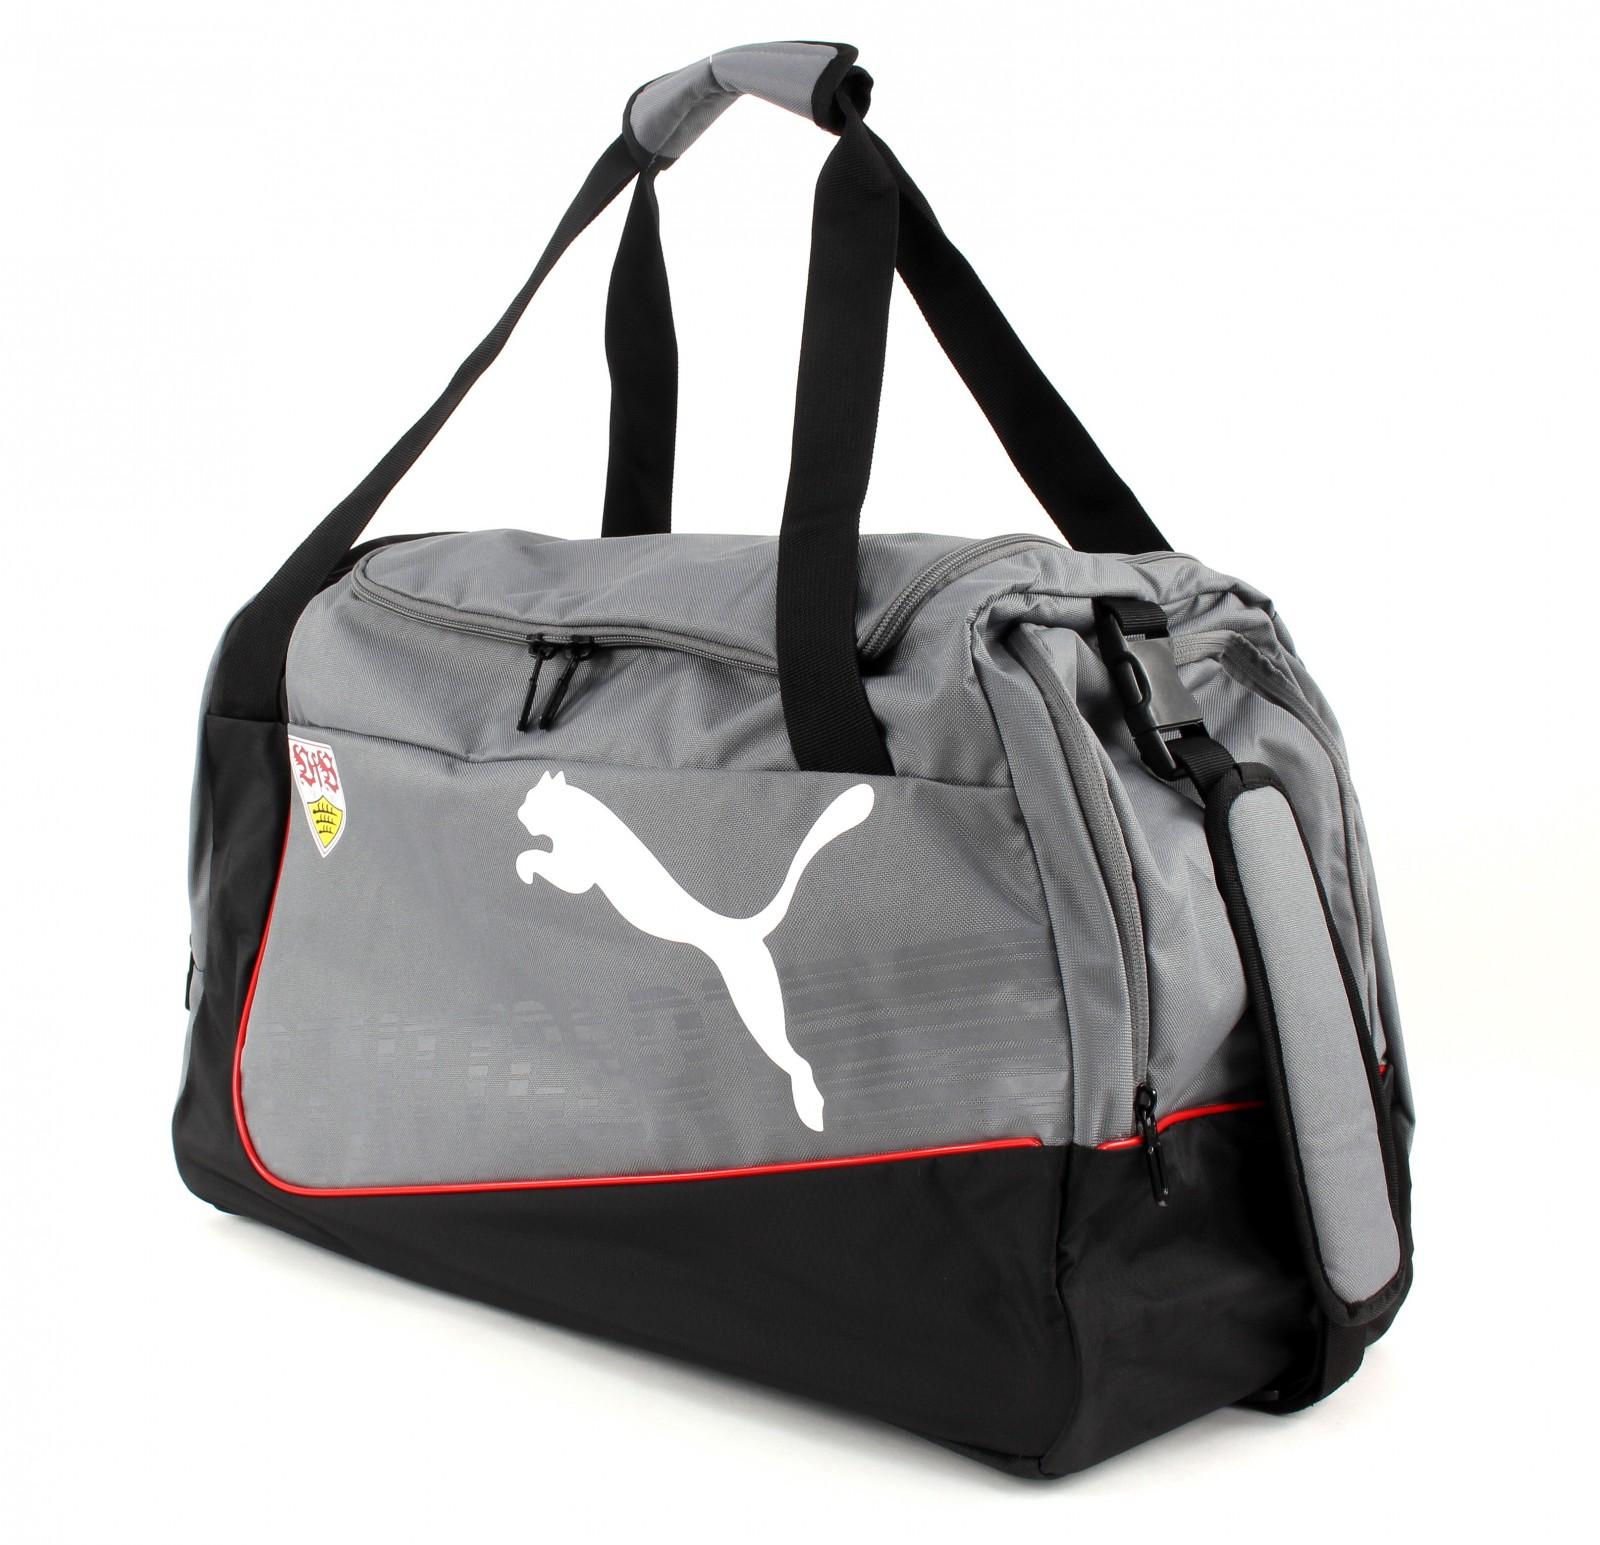 puma sports bag vfb stuttgart evopower medium grey dawn puma black. Black Bedroom Furniture Sets. Home Design Ideas